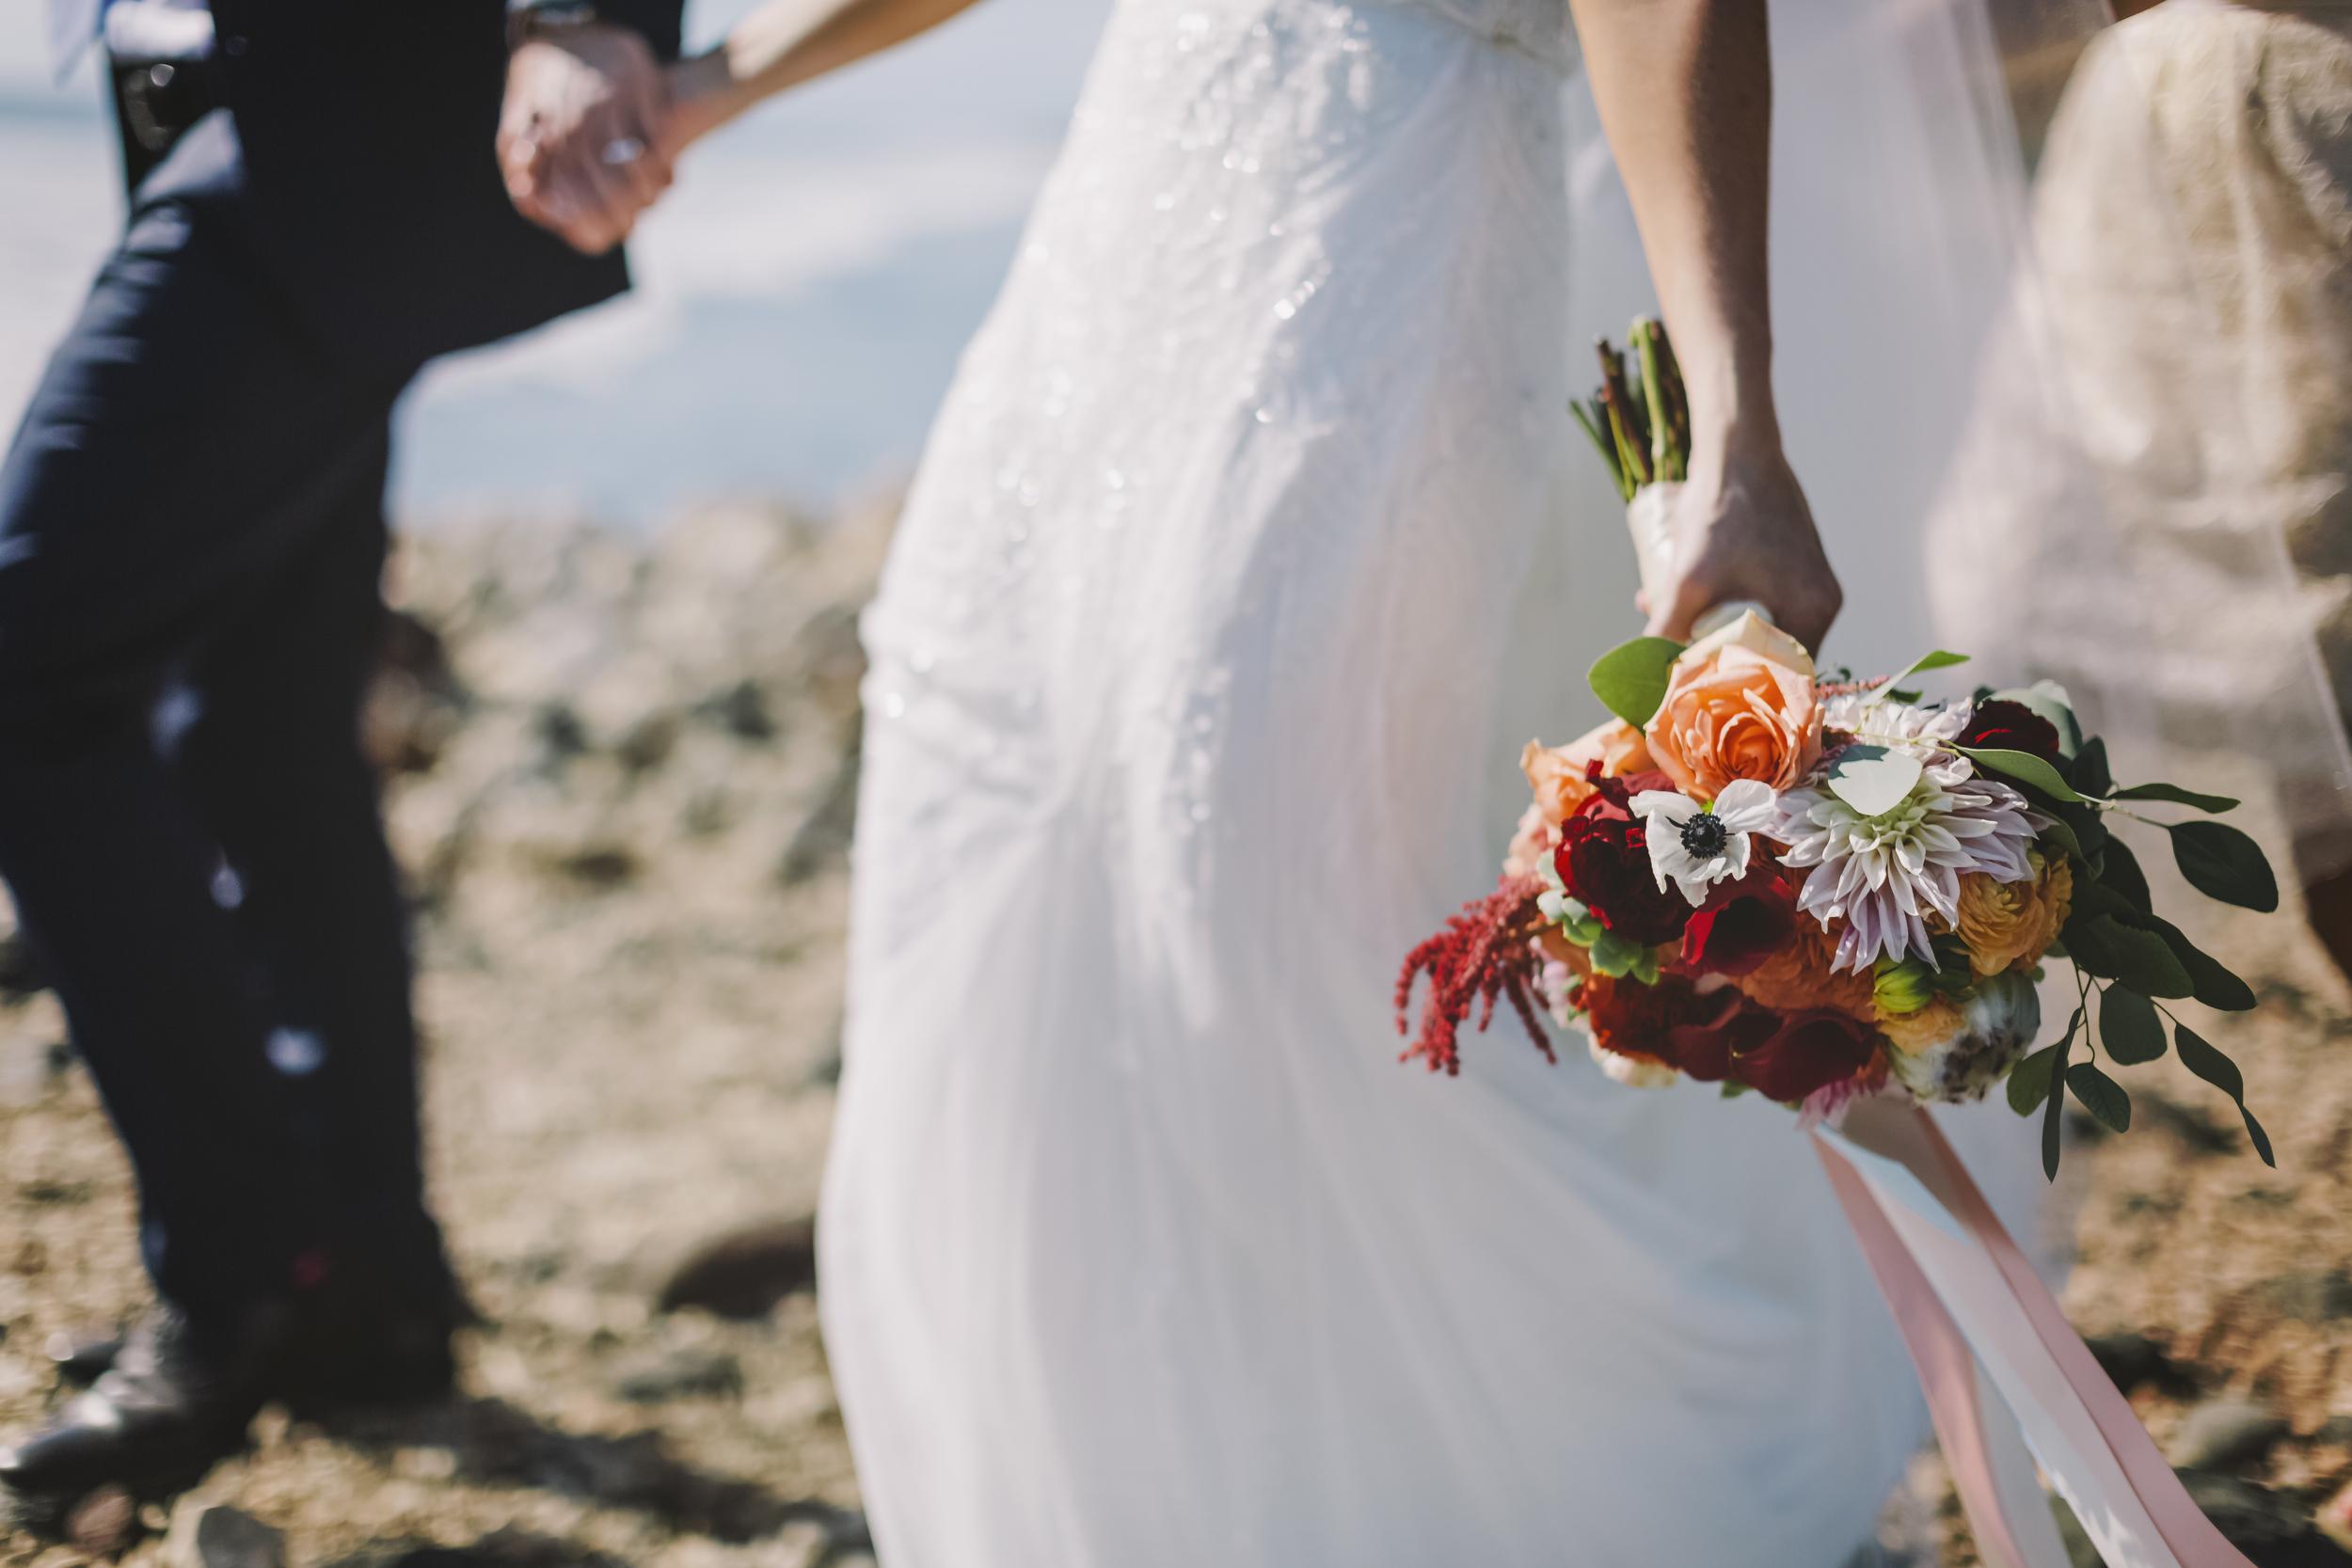 angie-diaz-photography-maui-wedding-mel-matt-49.jpeg